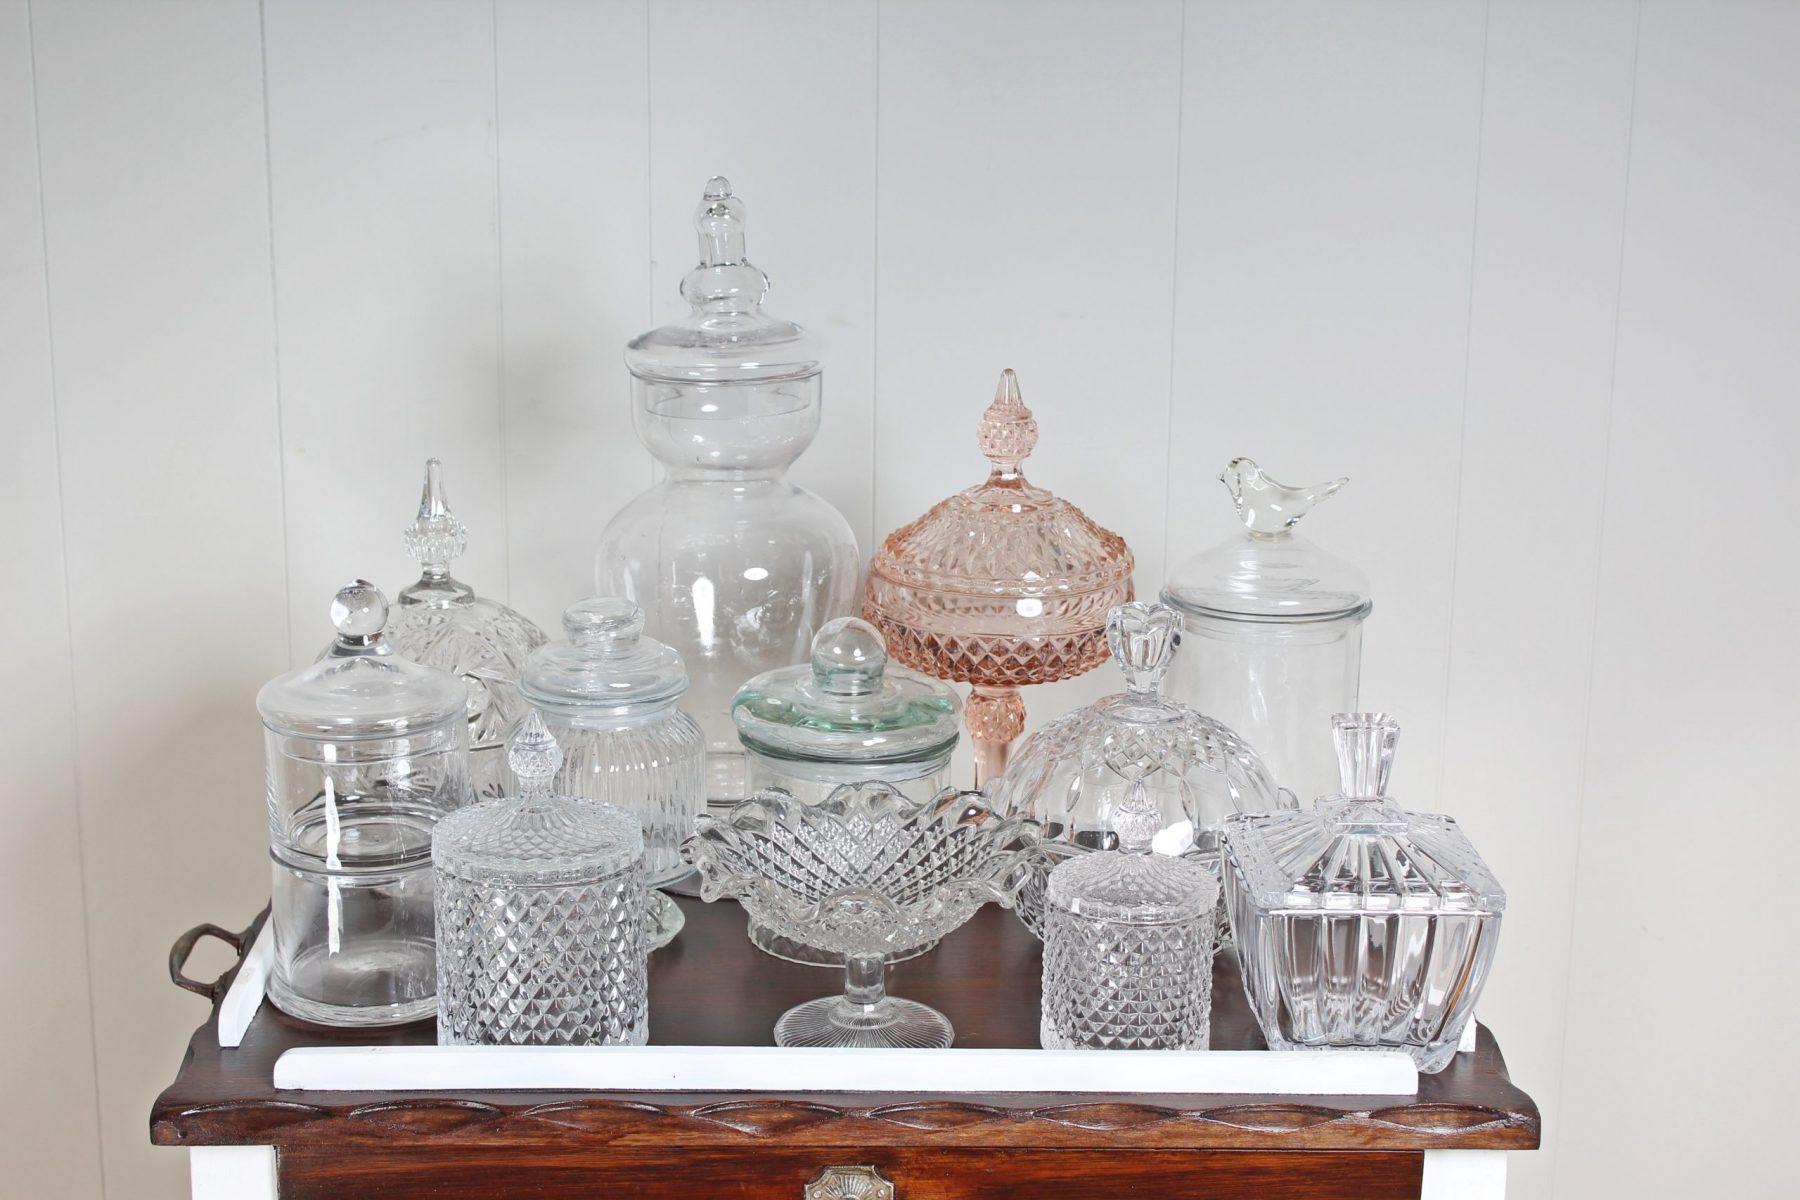 lolly buffet jars3